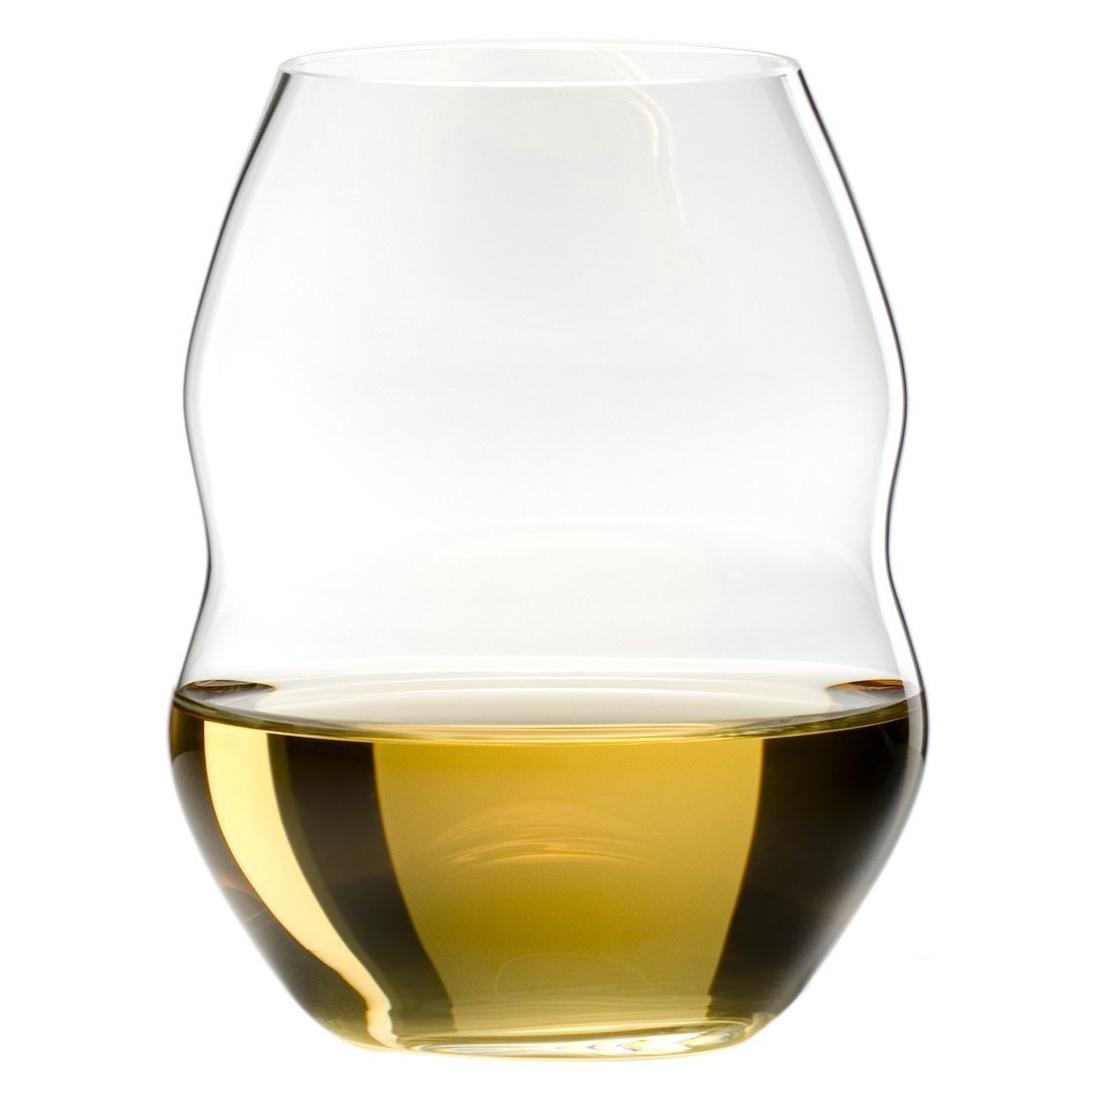 Riedel Swirl Stemless White Wine Glass, Set of 2